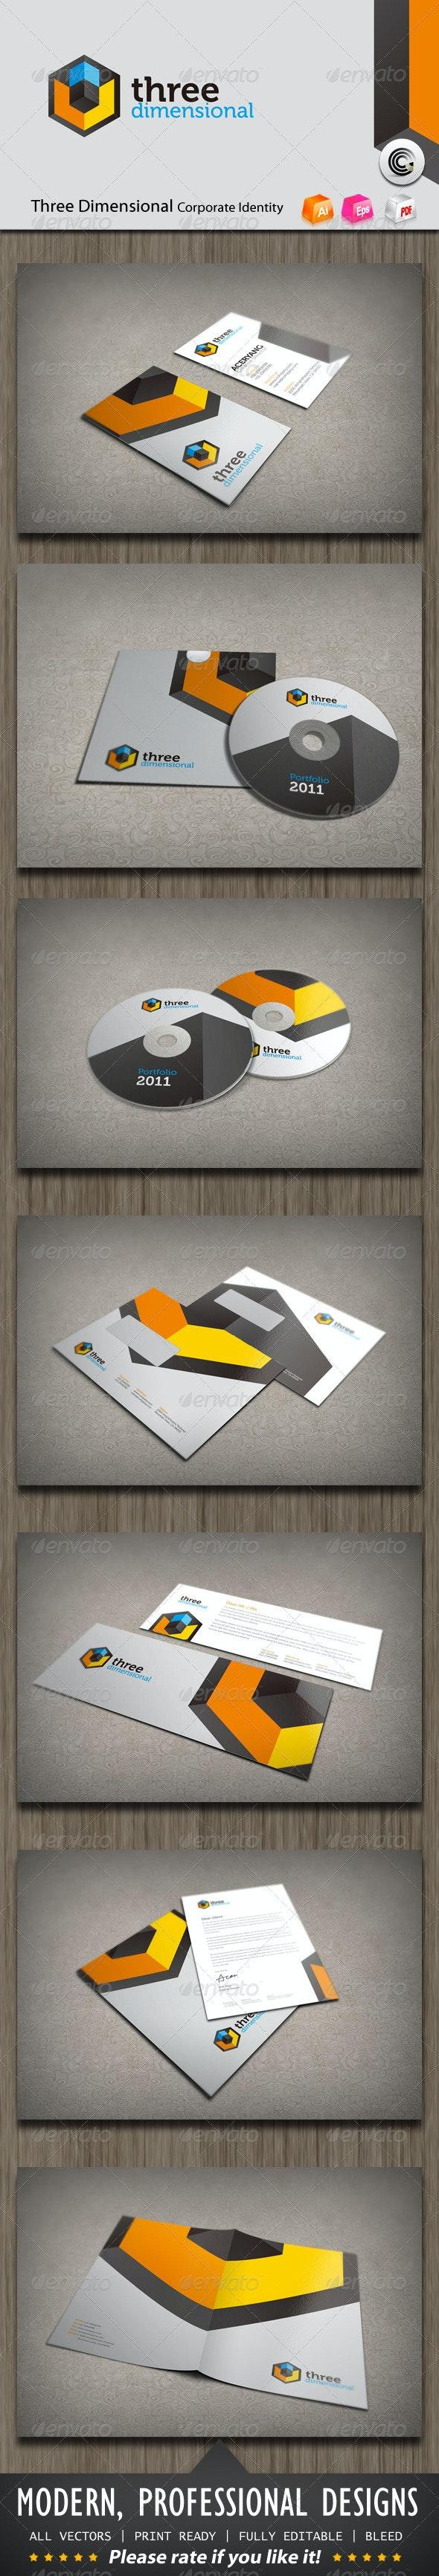 Three Dimensional Corporate Identity - Stationery Print Templates